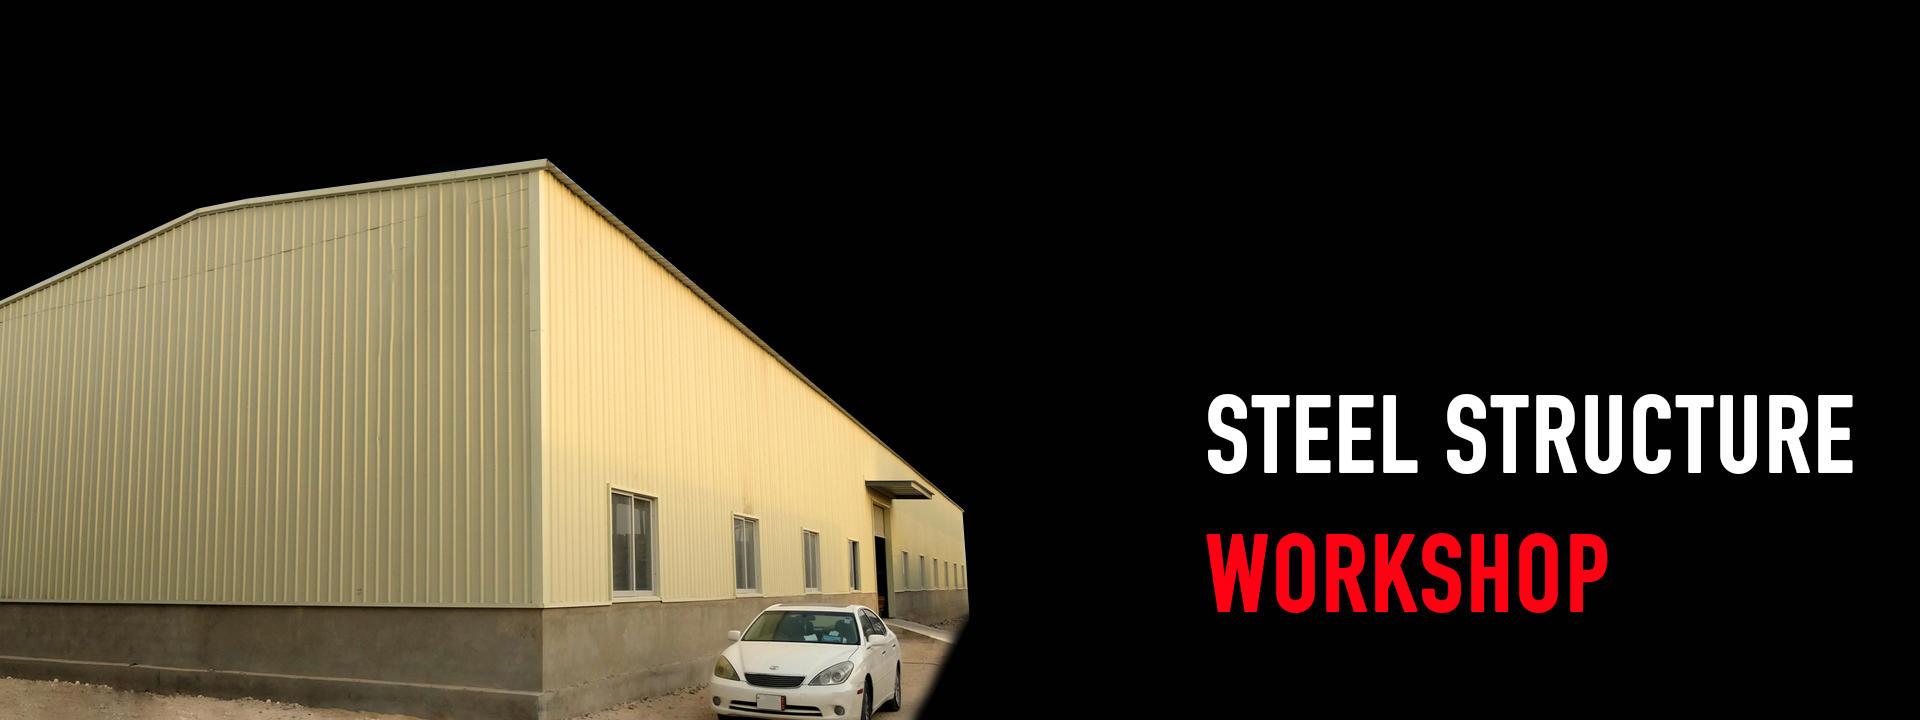 category-prefab warehouse-WELLCAMP, WELLCAMP prefab house, WELLCAMP container house-img-1